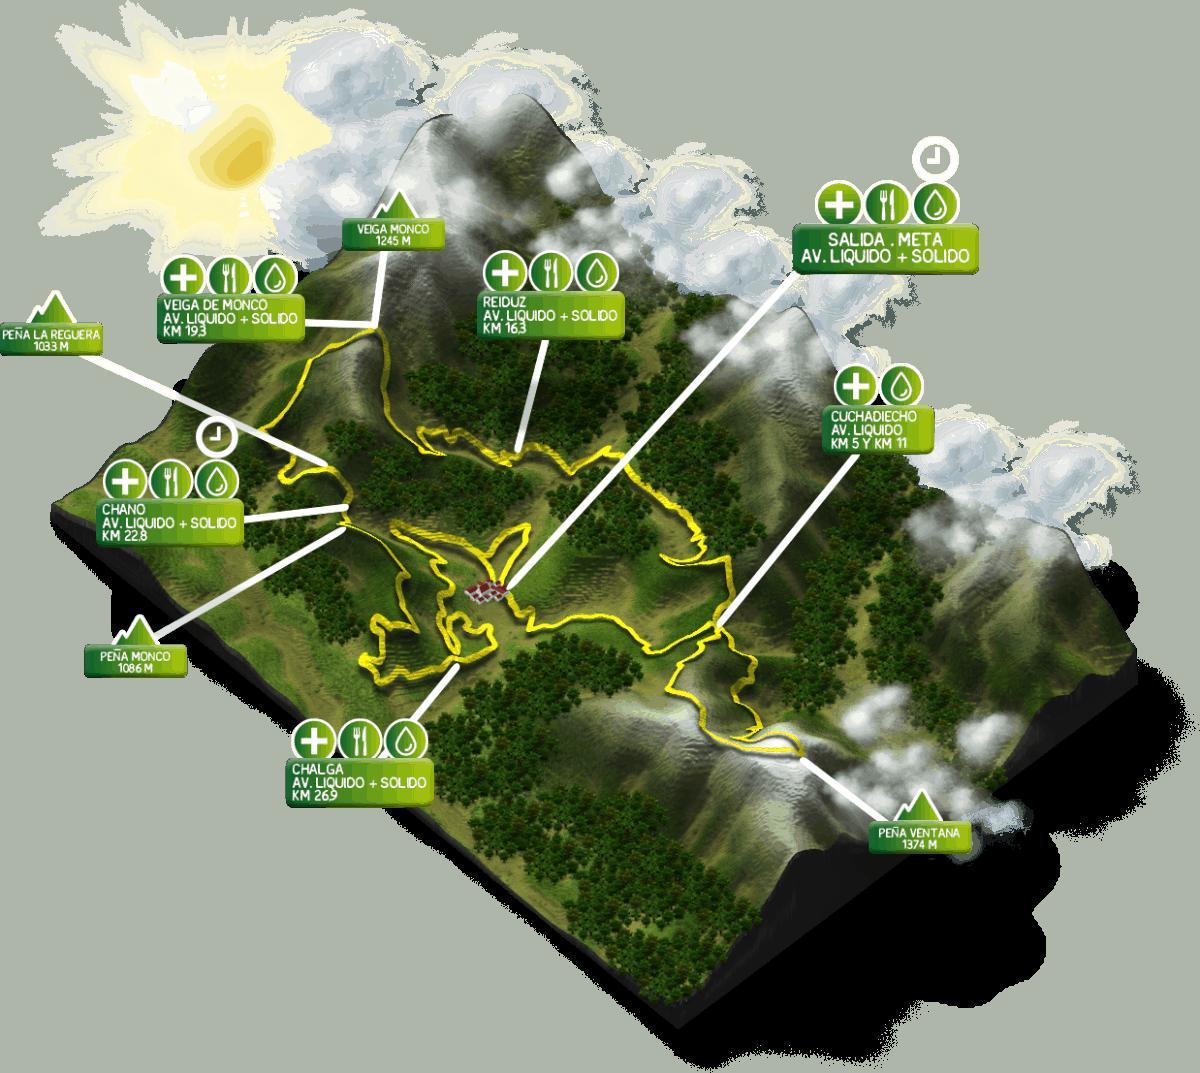 K32 Puerta de Muniellos Mapa 3D